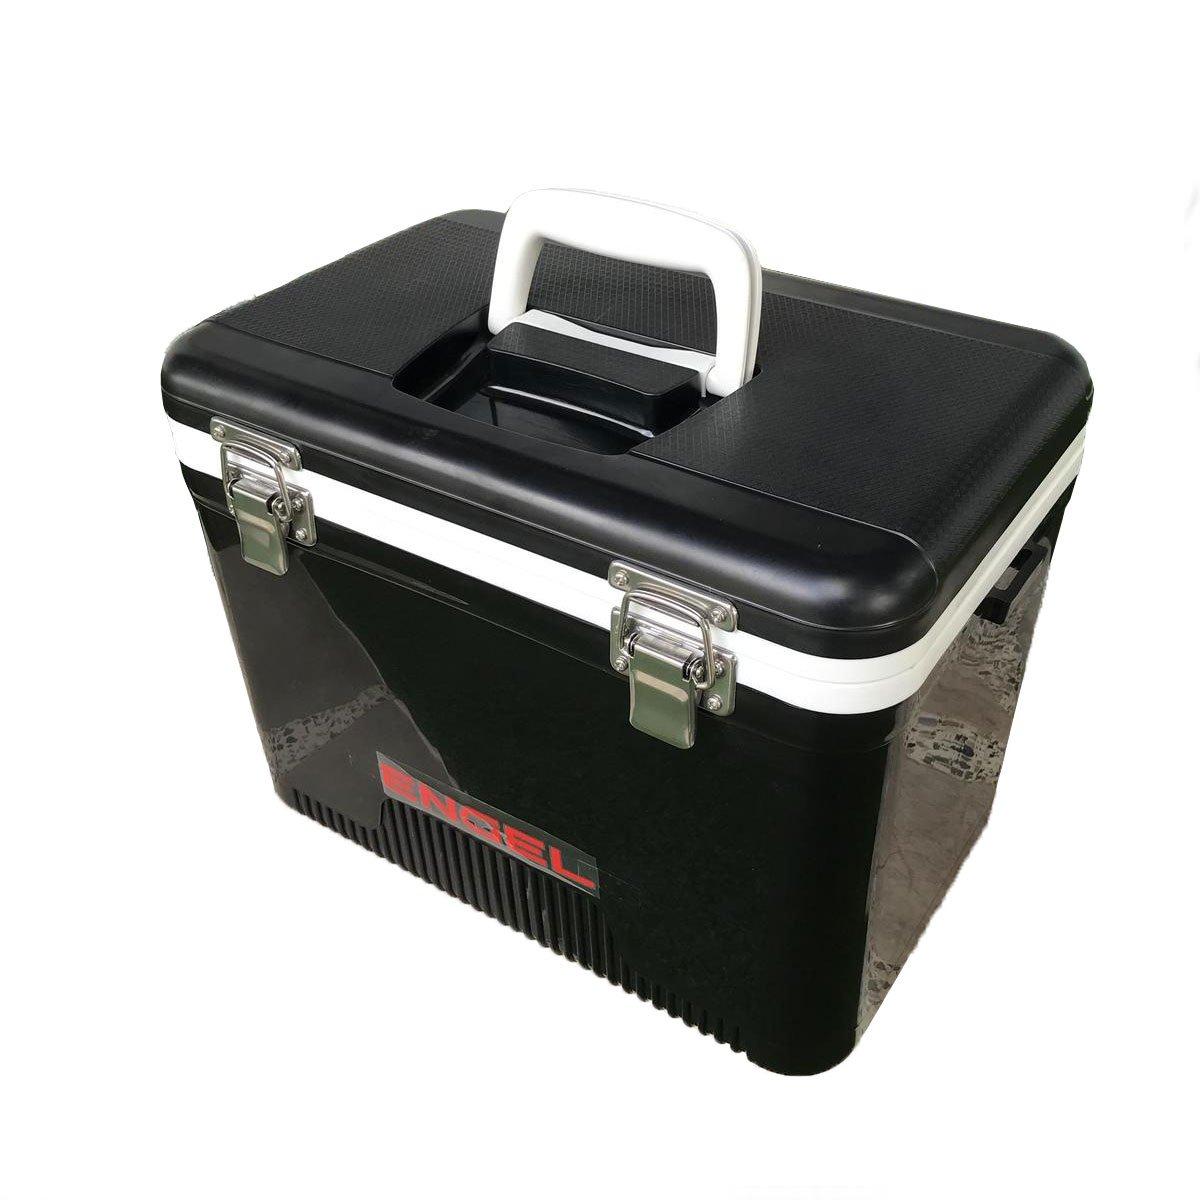 Engel 19 Quart 32 Can Leak Proof Odor Resistant Insulated Cooler Drybox, Black